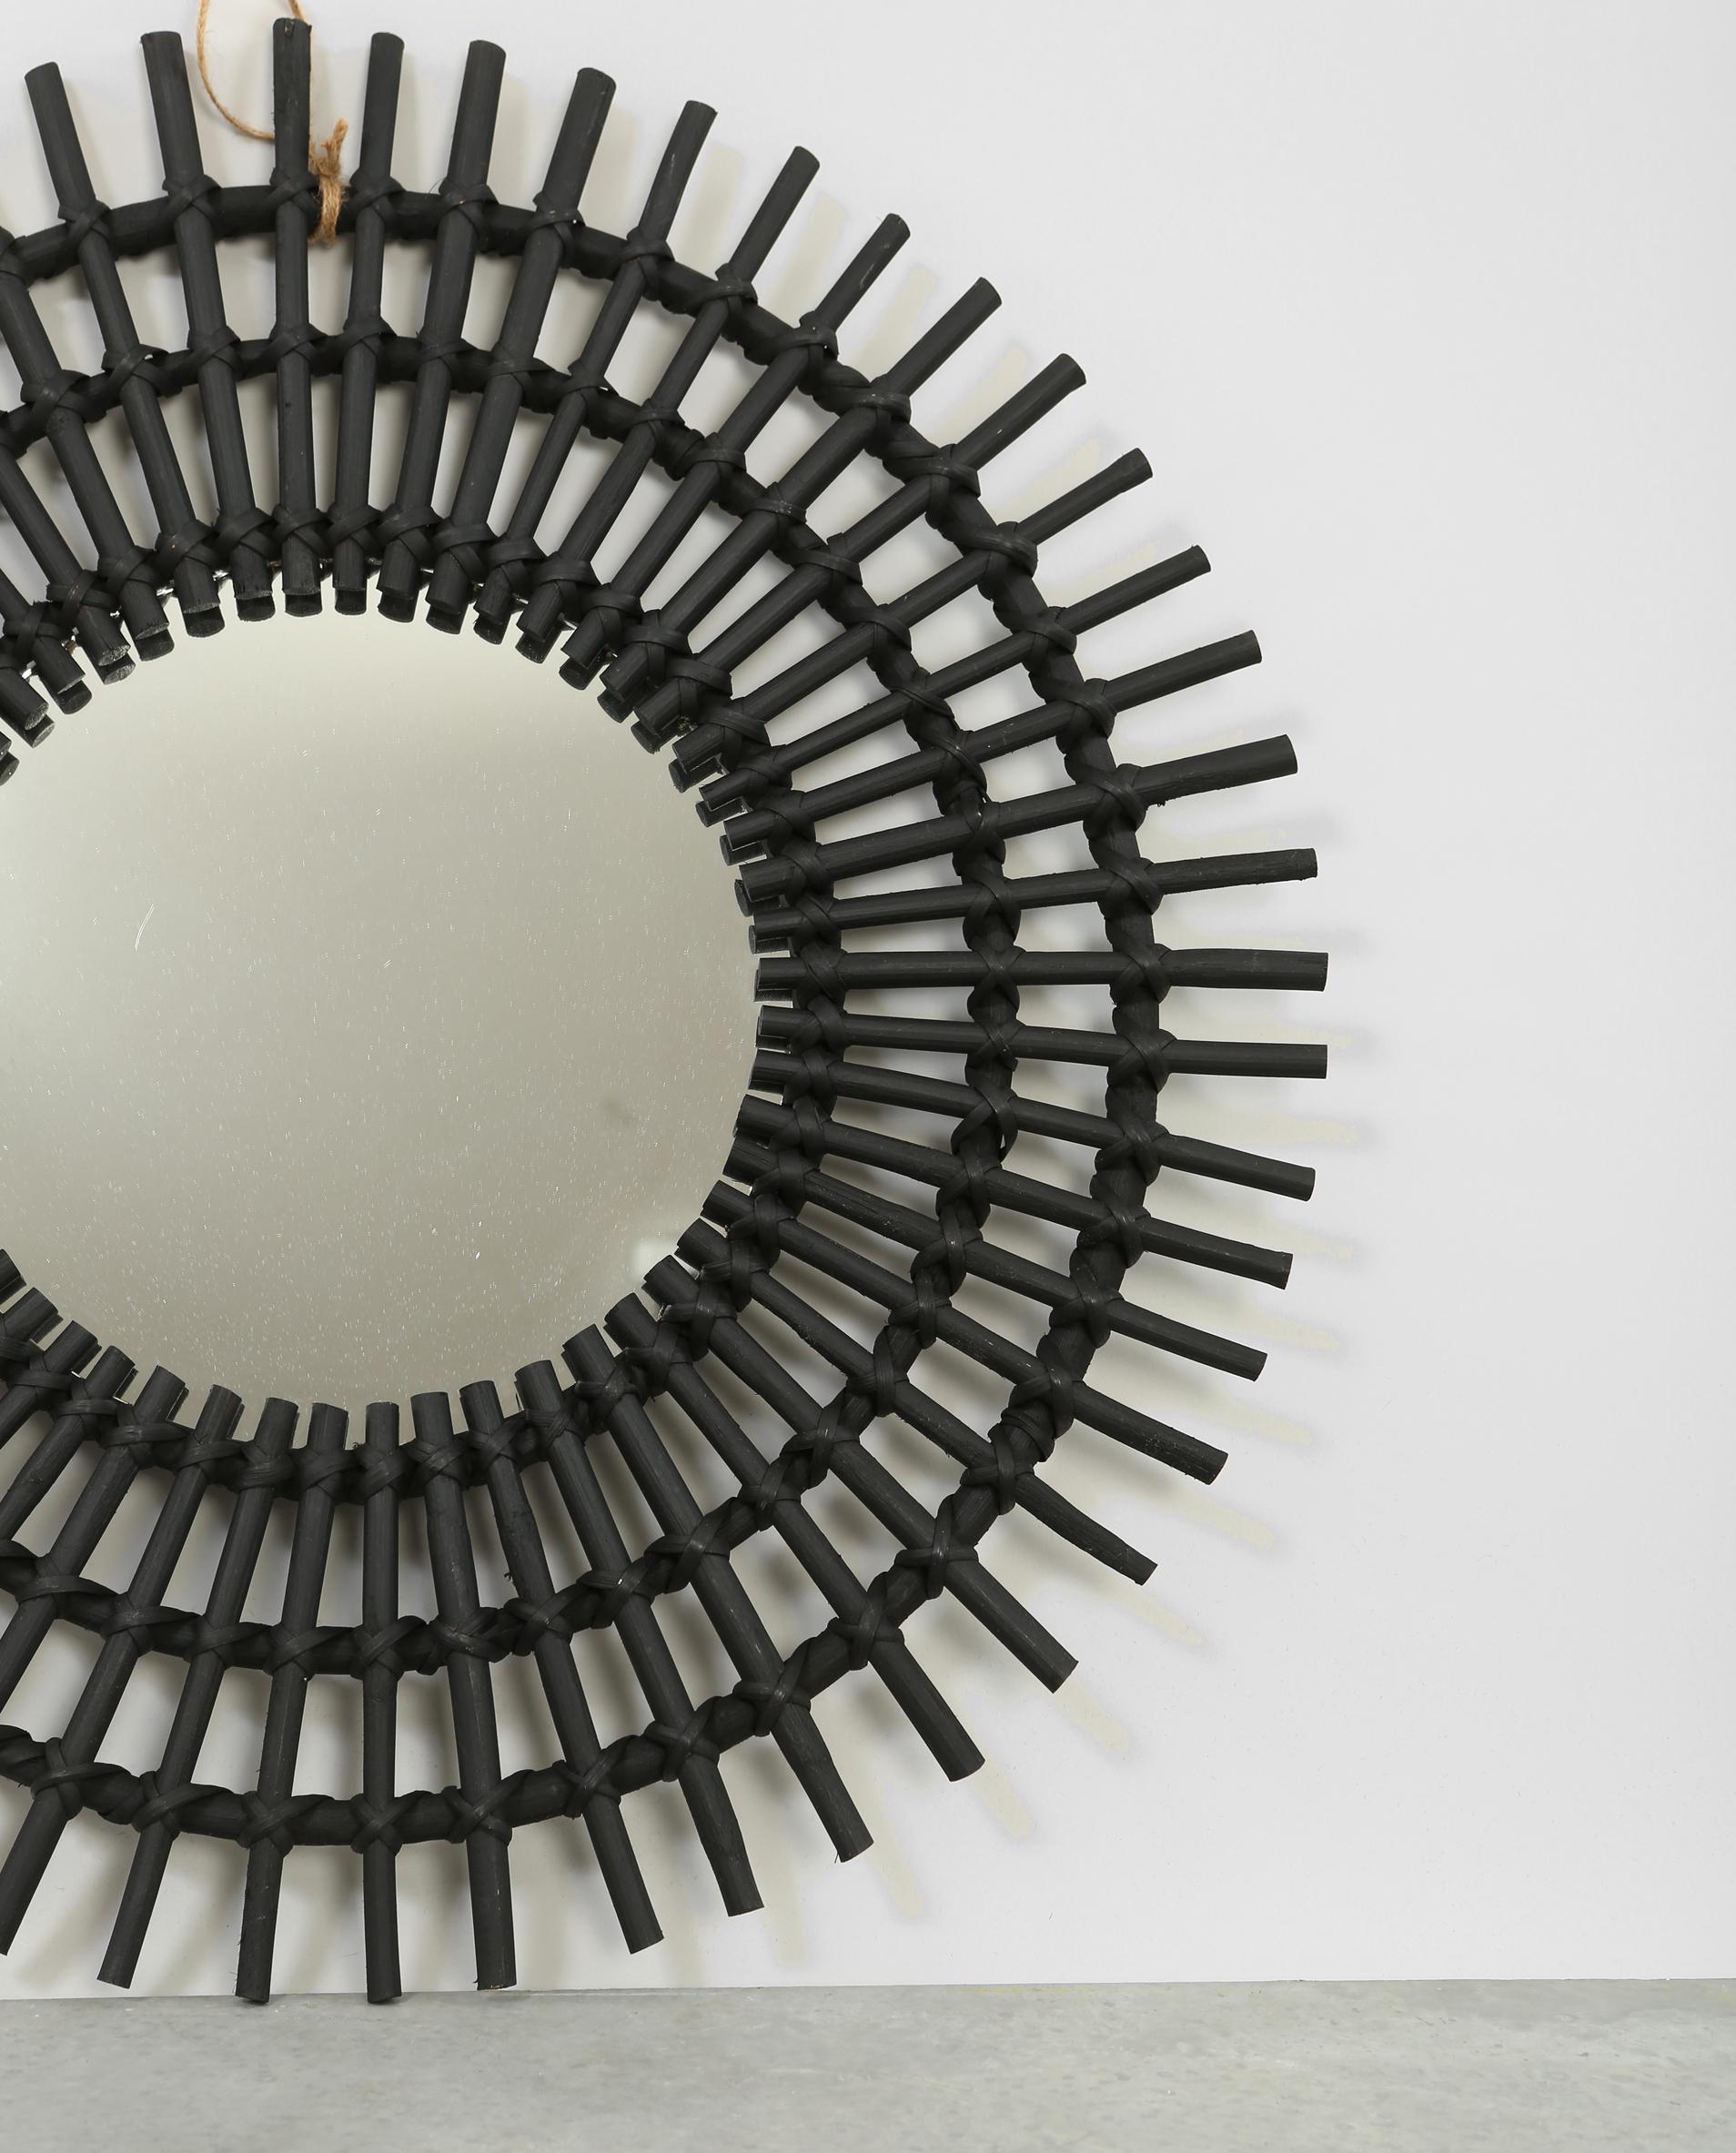 miroir soleil en rotin noir 902206899a07 pimkie. Black Bedroom Furniture Sets. Home Design Ideas